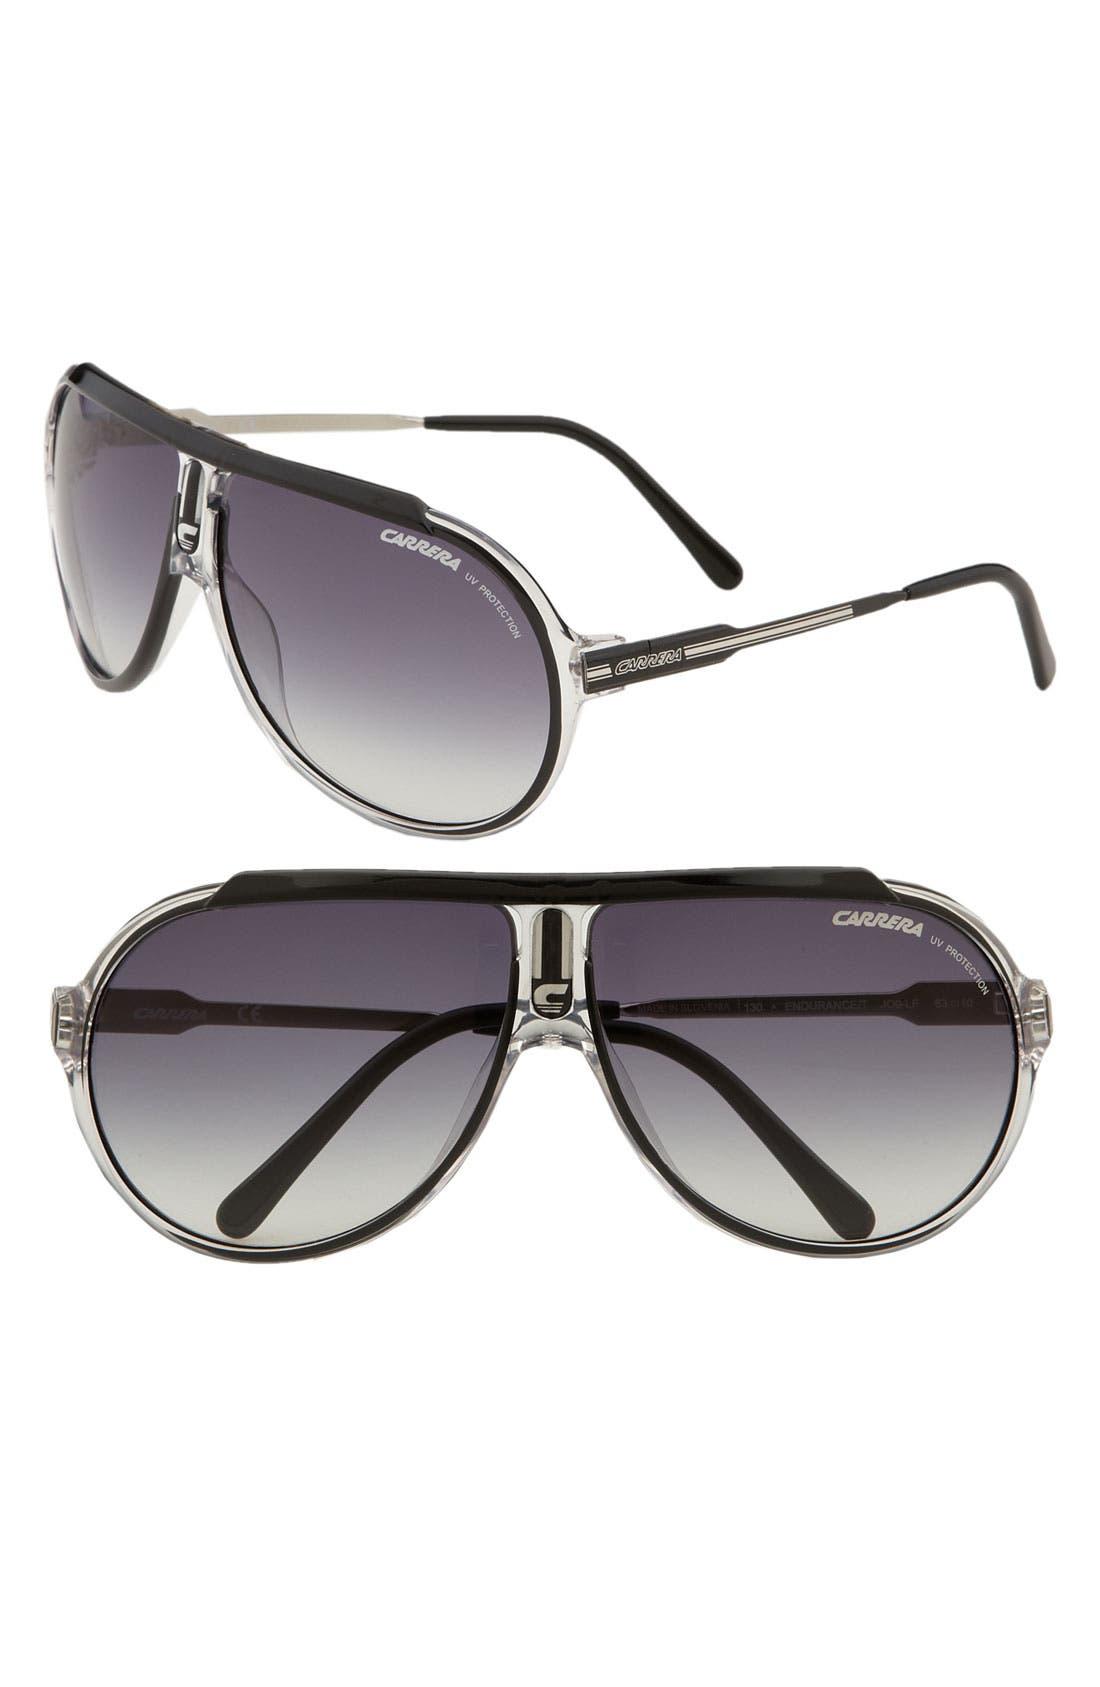 Alternate Image 1 Selected - Carrera Eyewear 'Endurance' 63mm Aviator Sunglasses